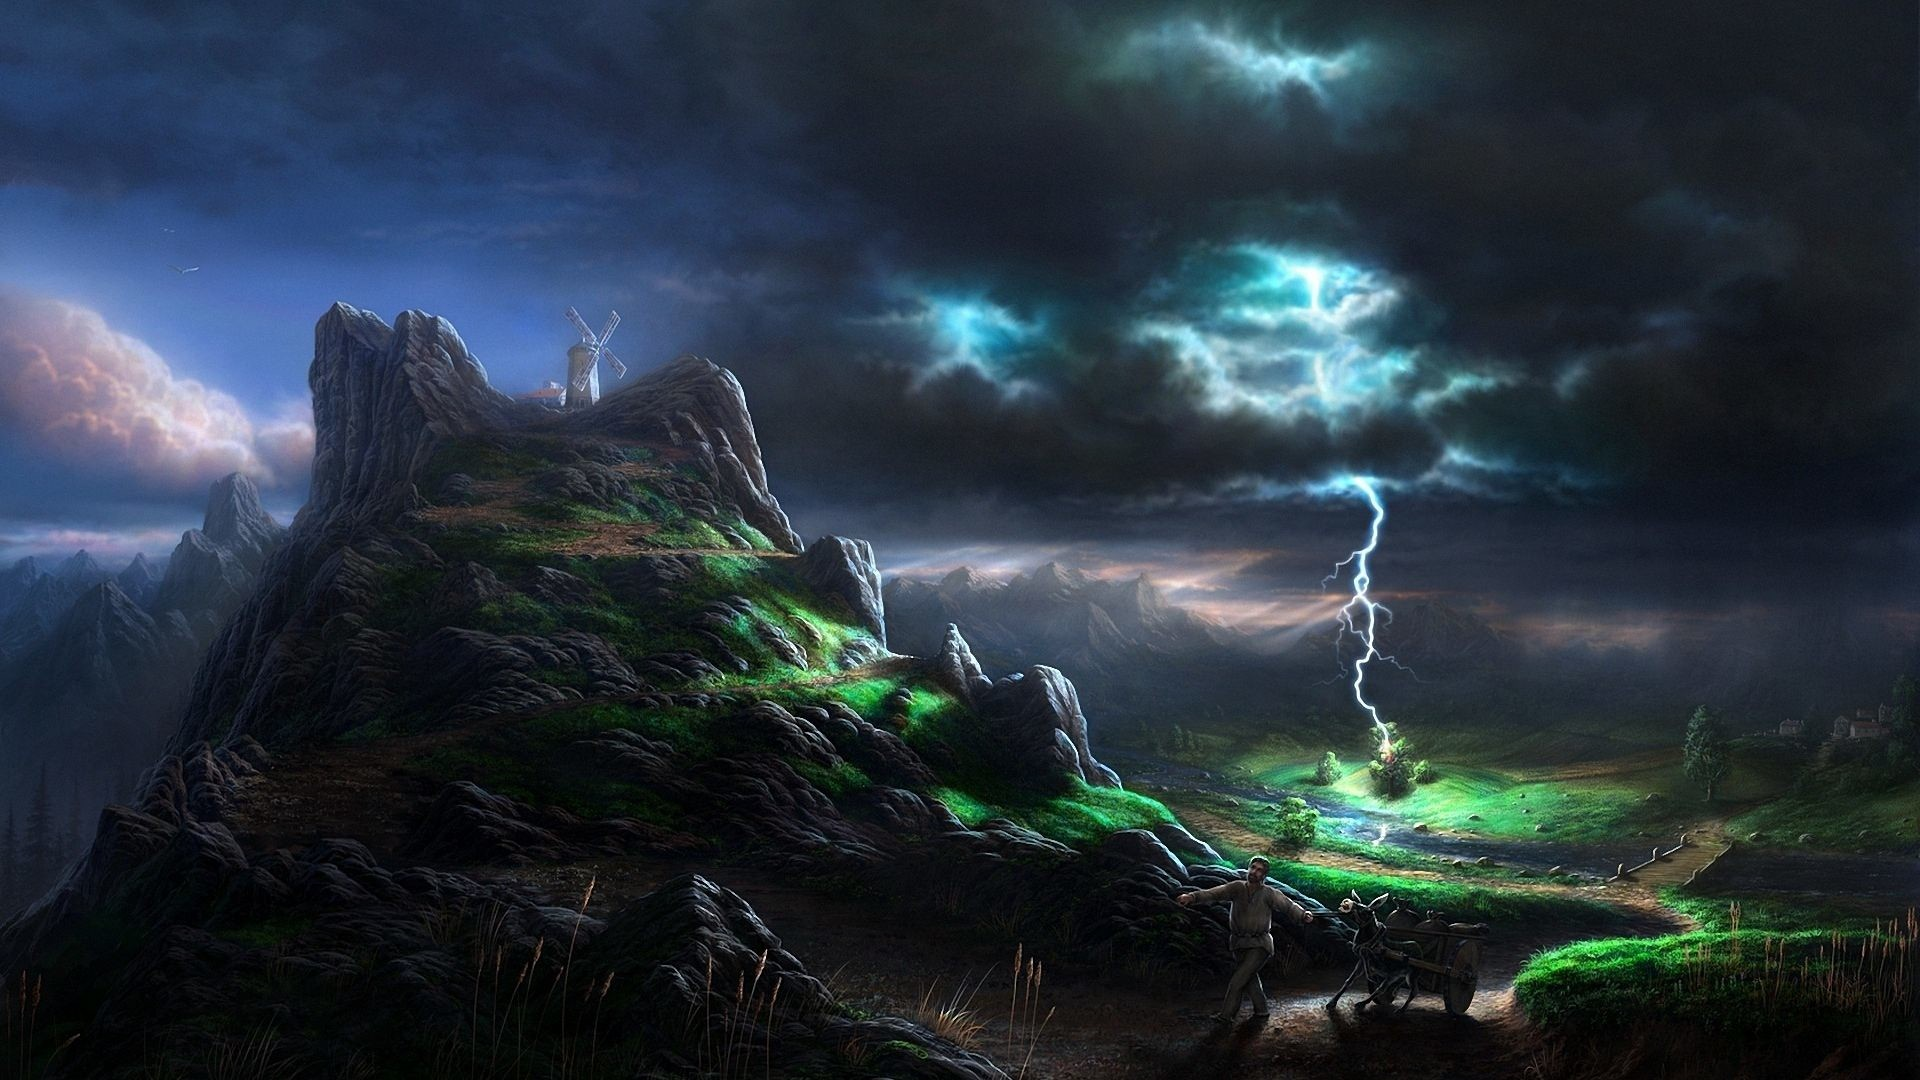 Lightning in Mountains Wallpaper